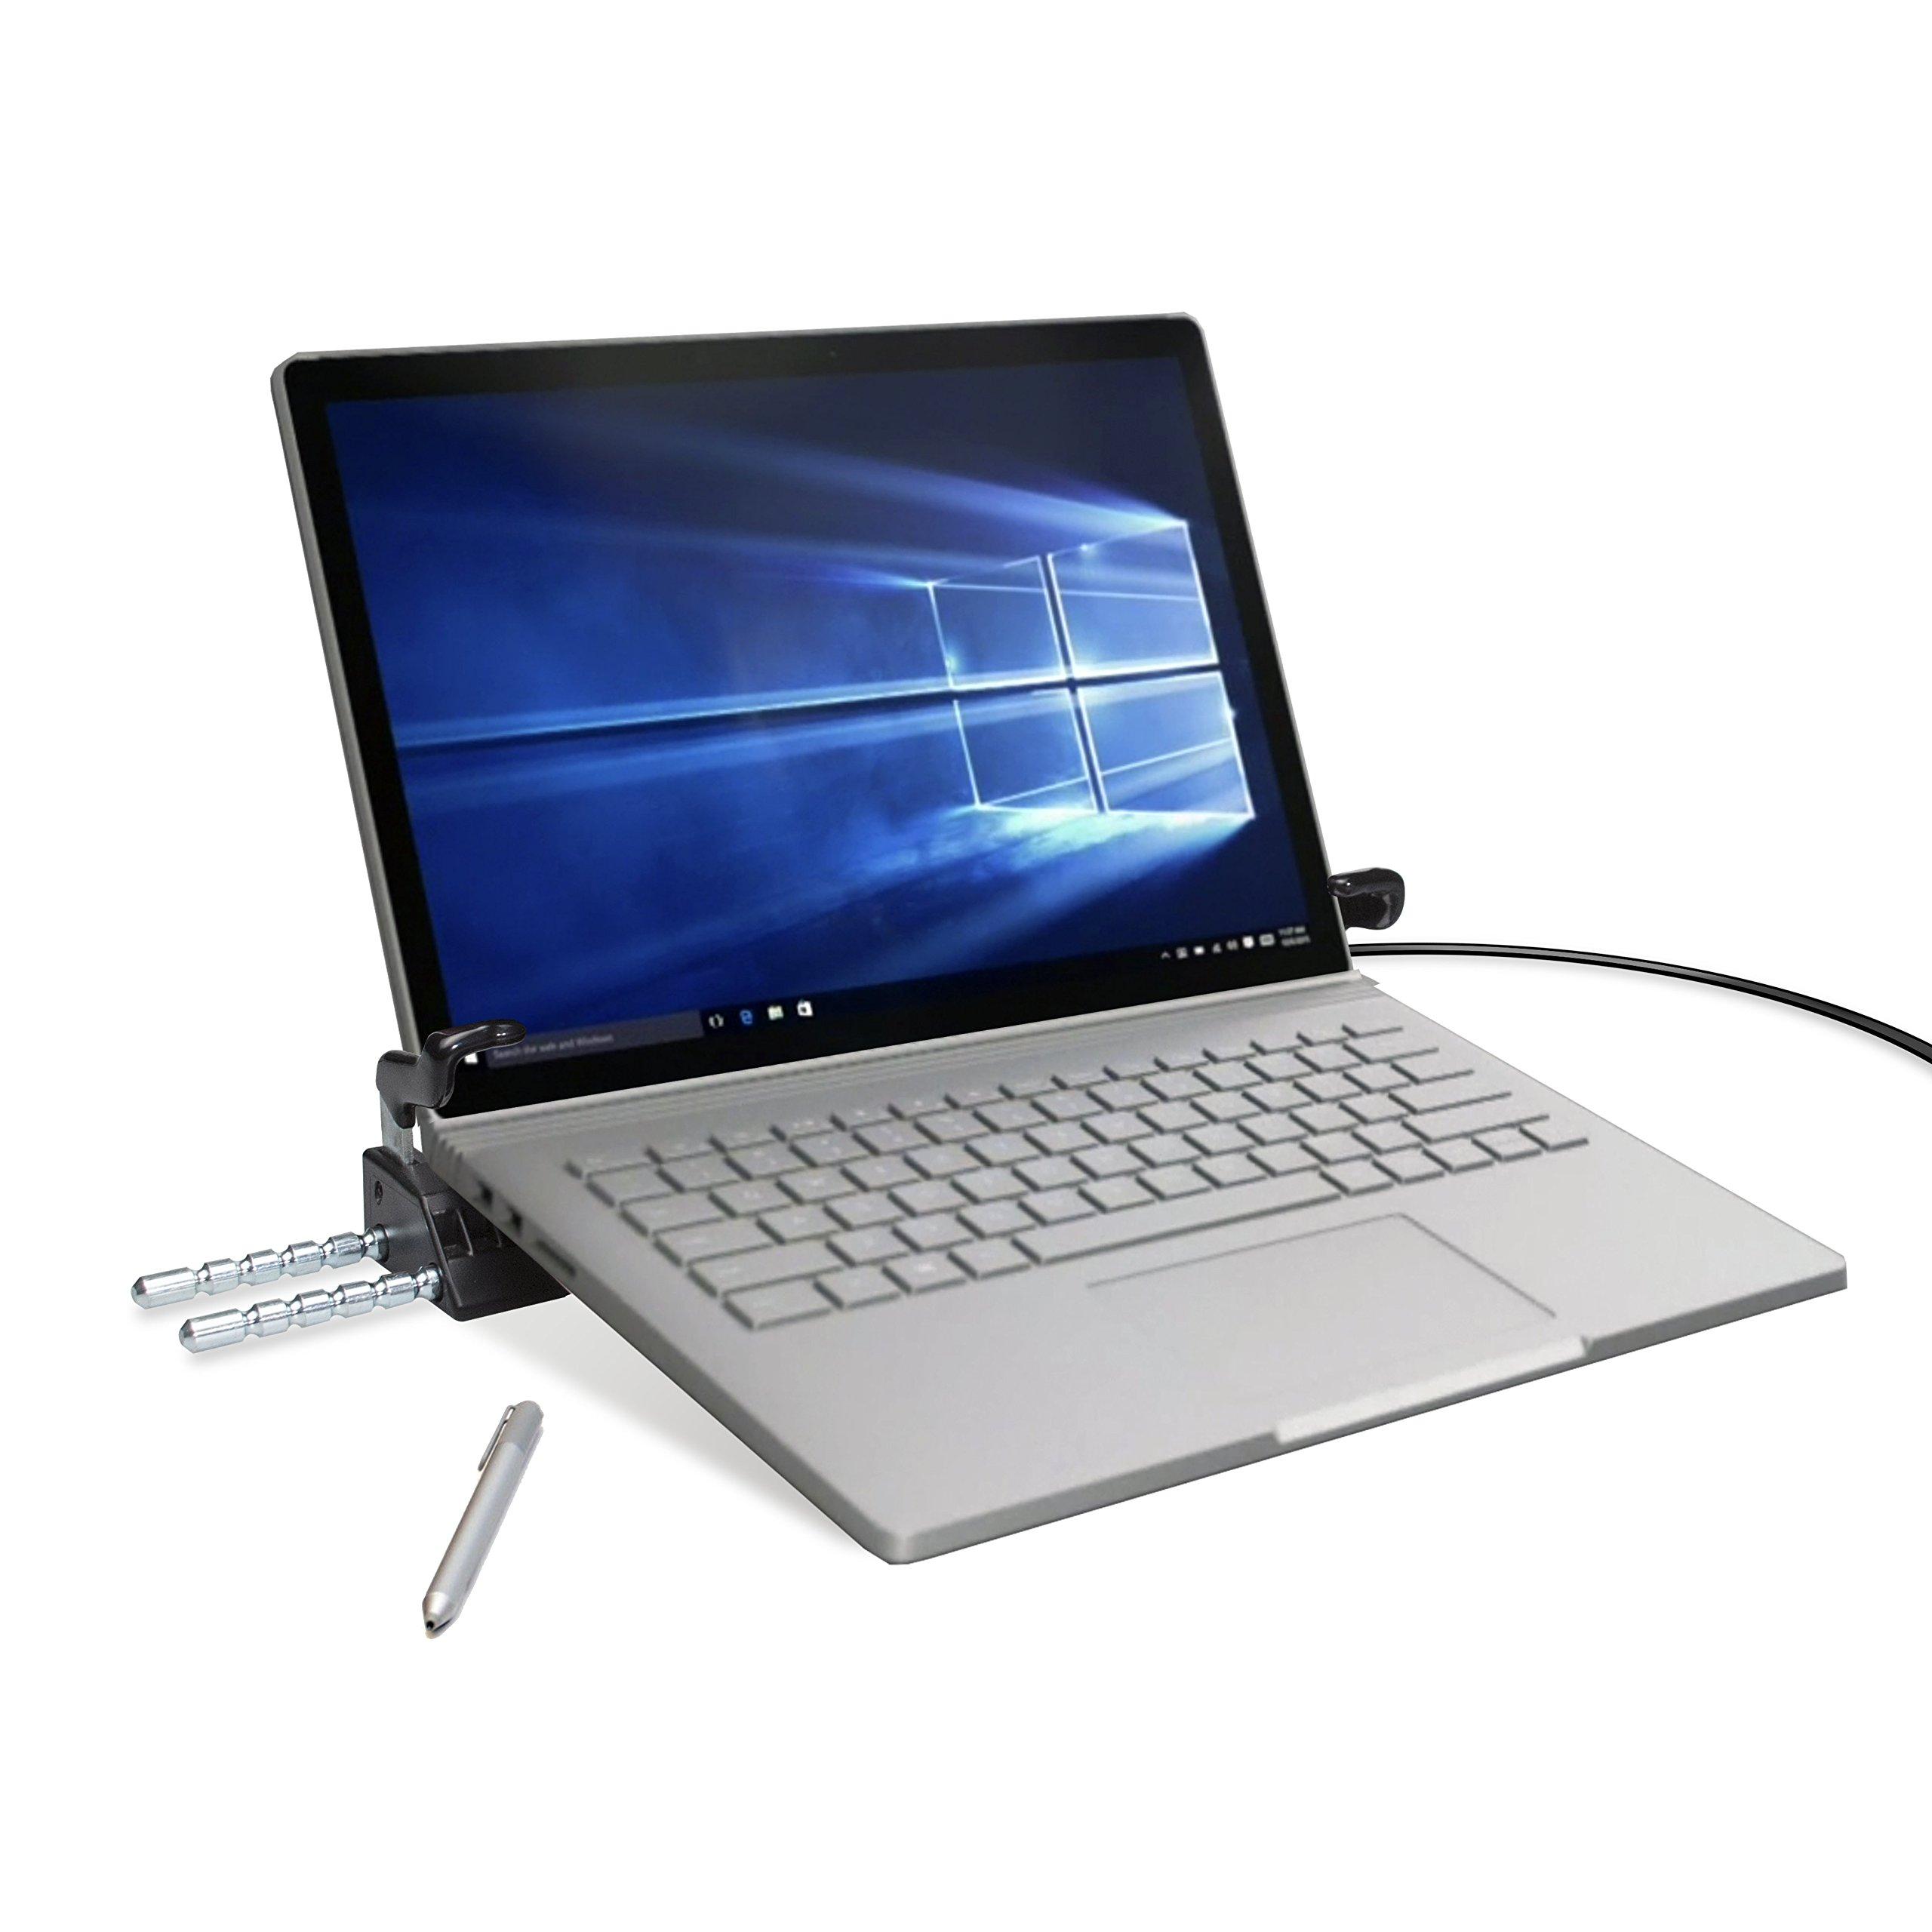 CTA Digital Heavy Duty Tri-Security Station for Tablet-Laptop Hybrids - PAD-SSLT by CTA Digital (Image #2)